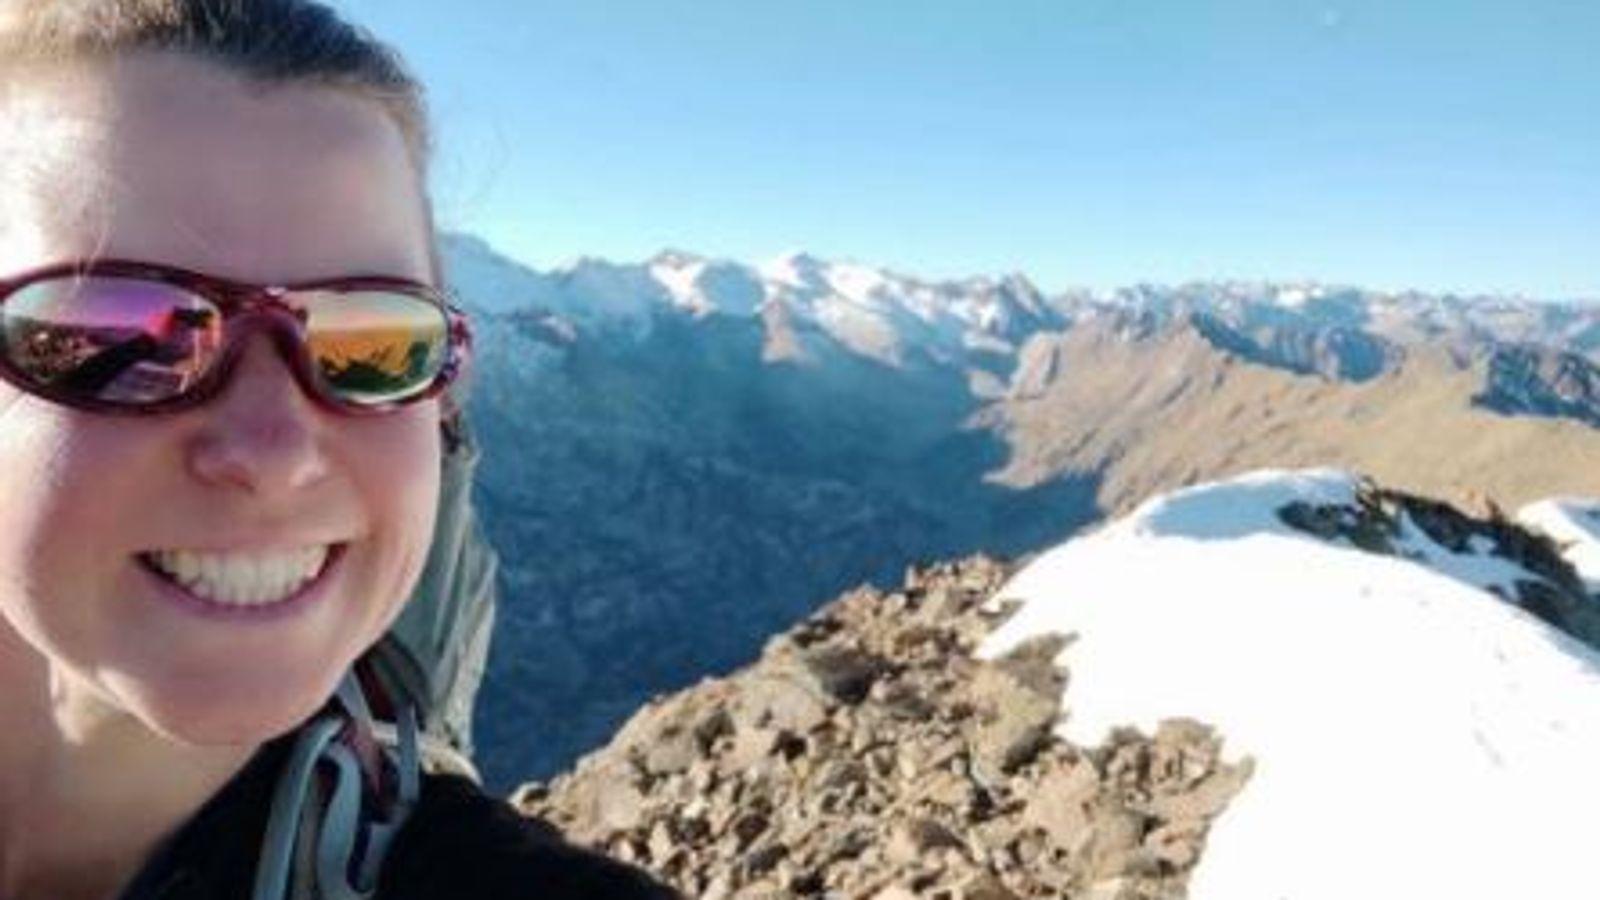 Esther Dingley: Missing British hiker's dental records being sent to France after 'human bones' found